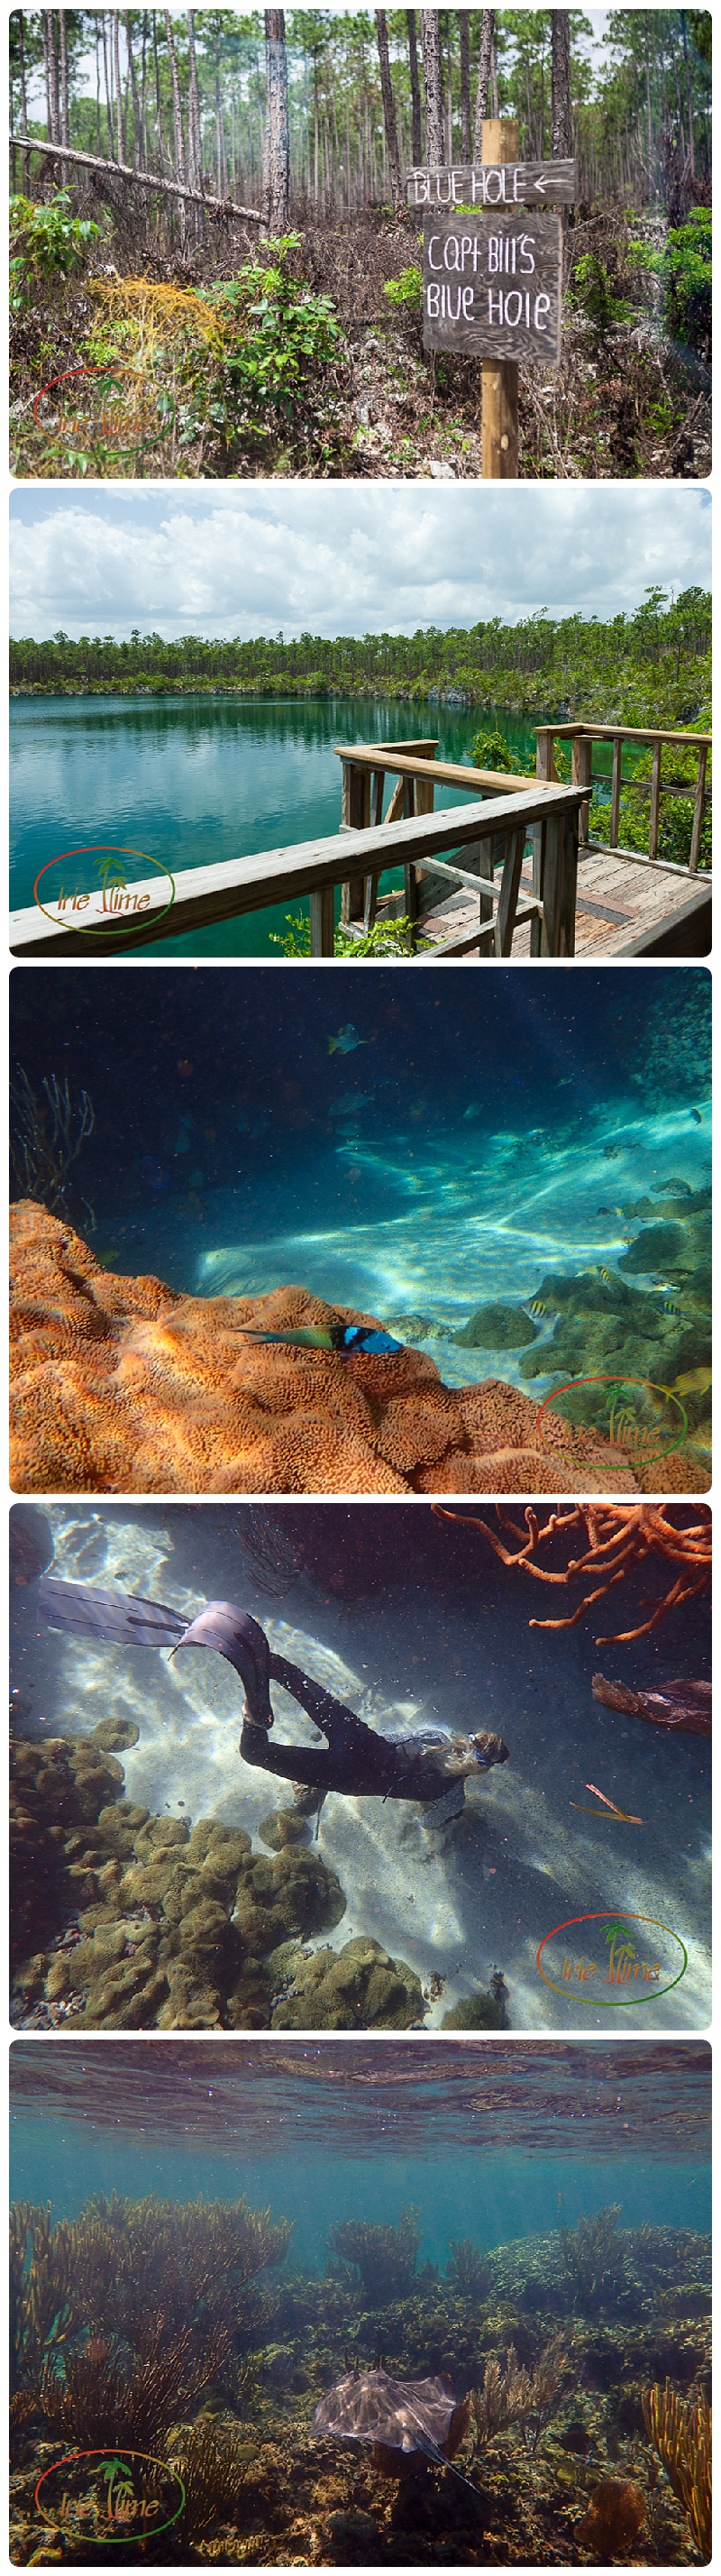 Blue Holes of Andros Bahamas #bahamas #kamalamecay #iheartkamalame #honeymoon